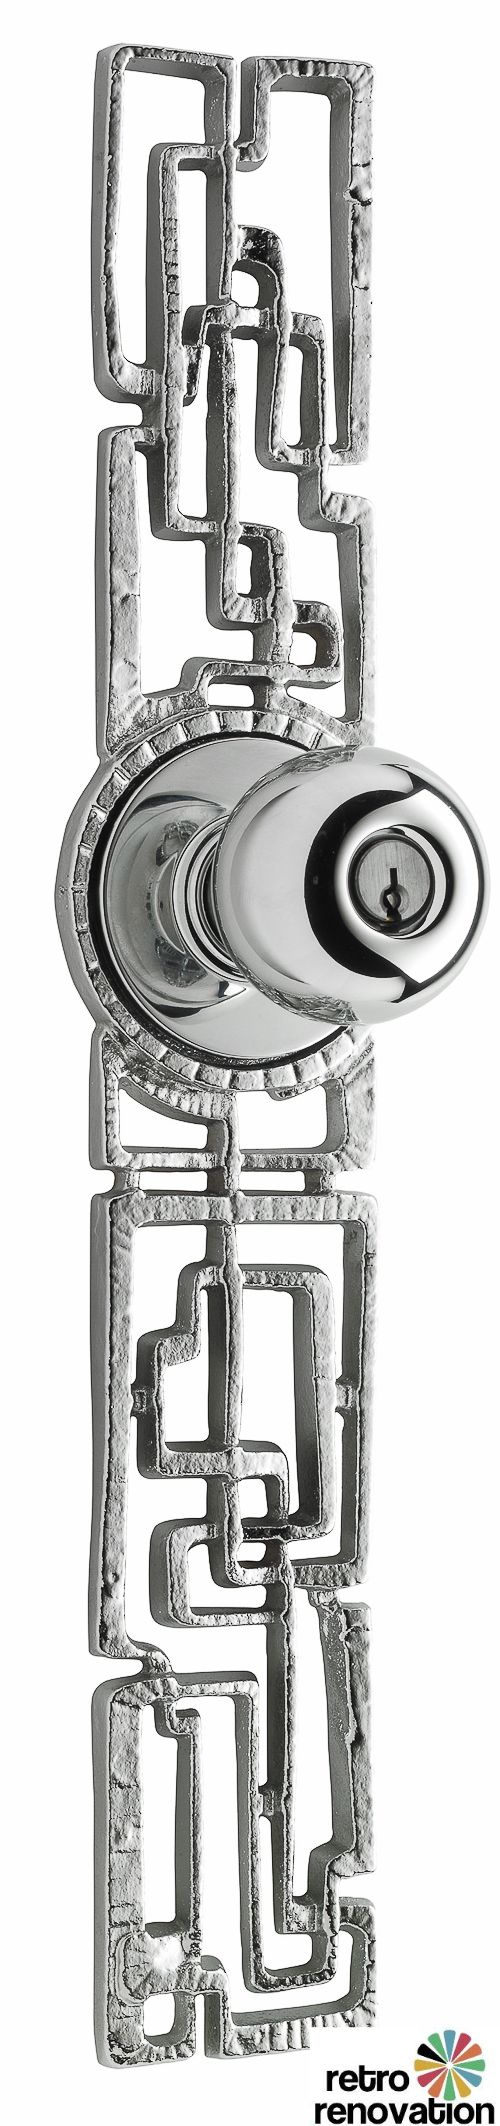 midcentury modern Samba exterior door hardware